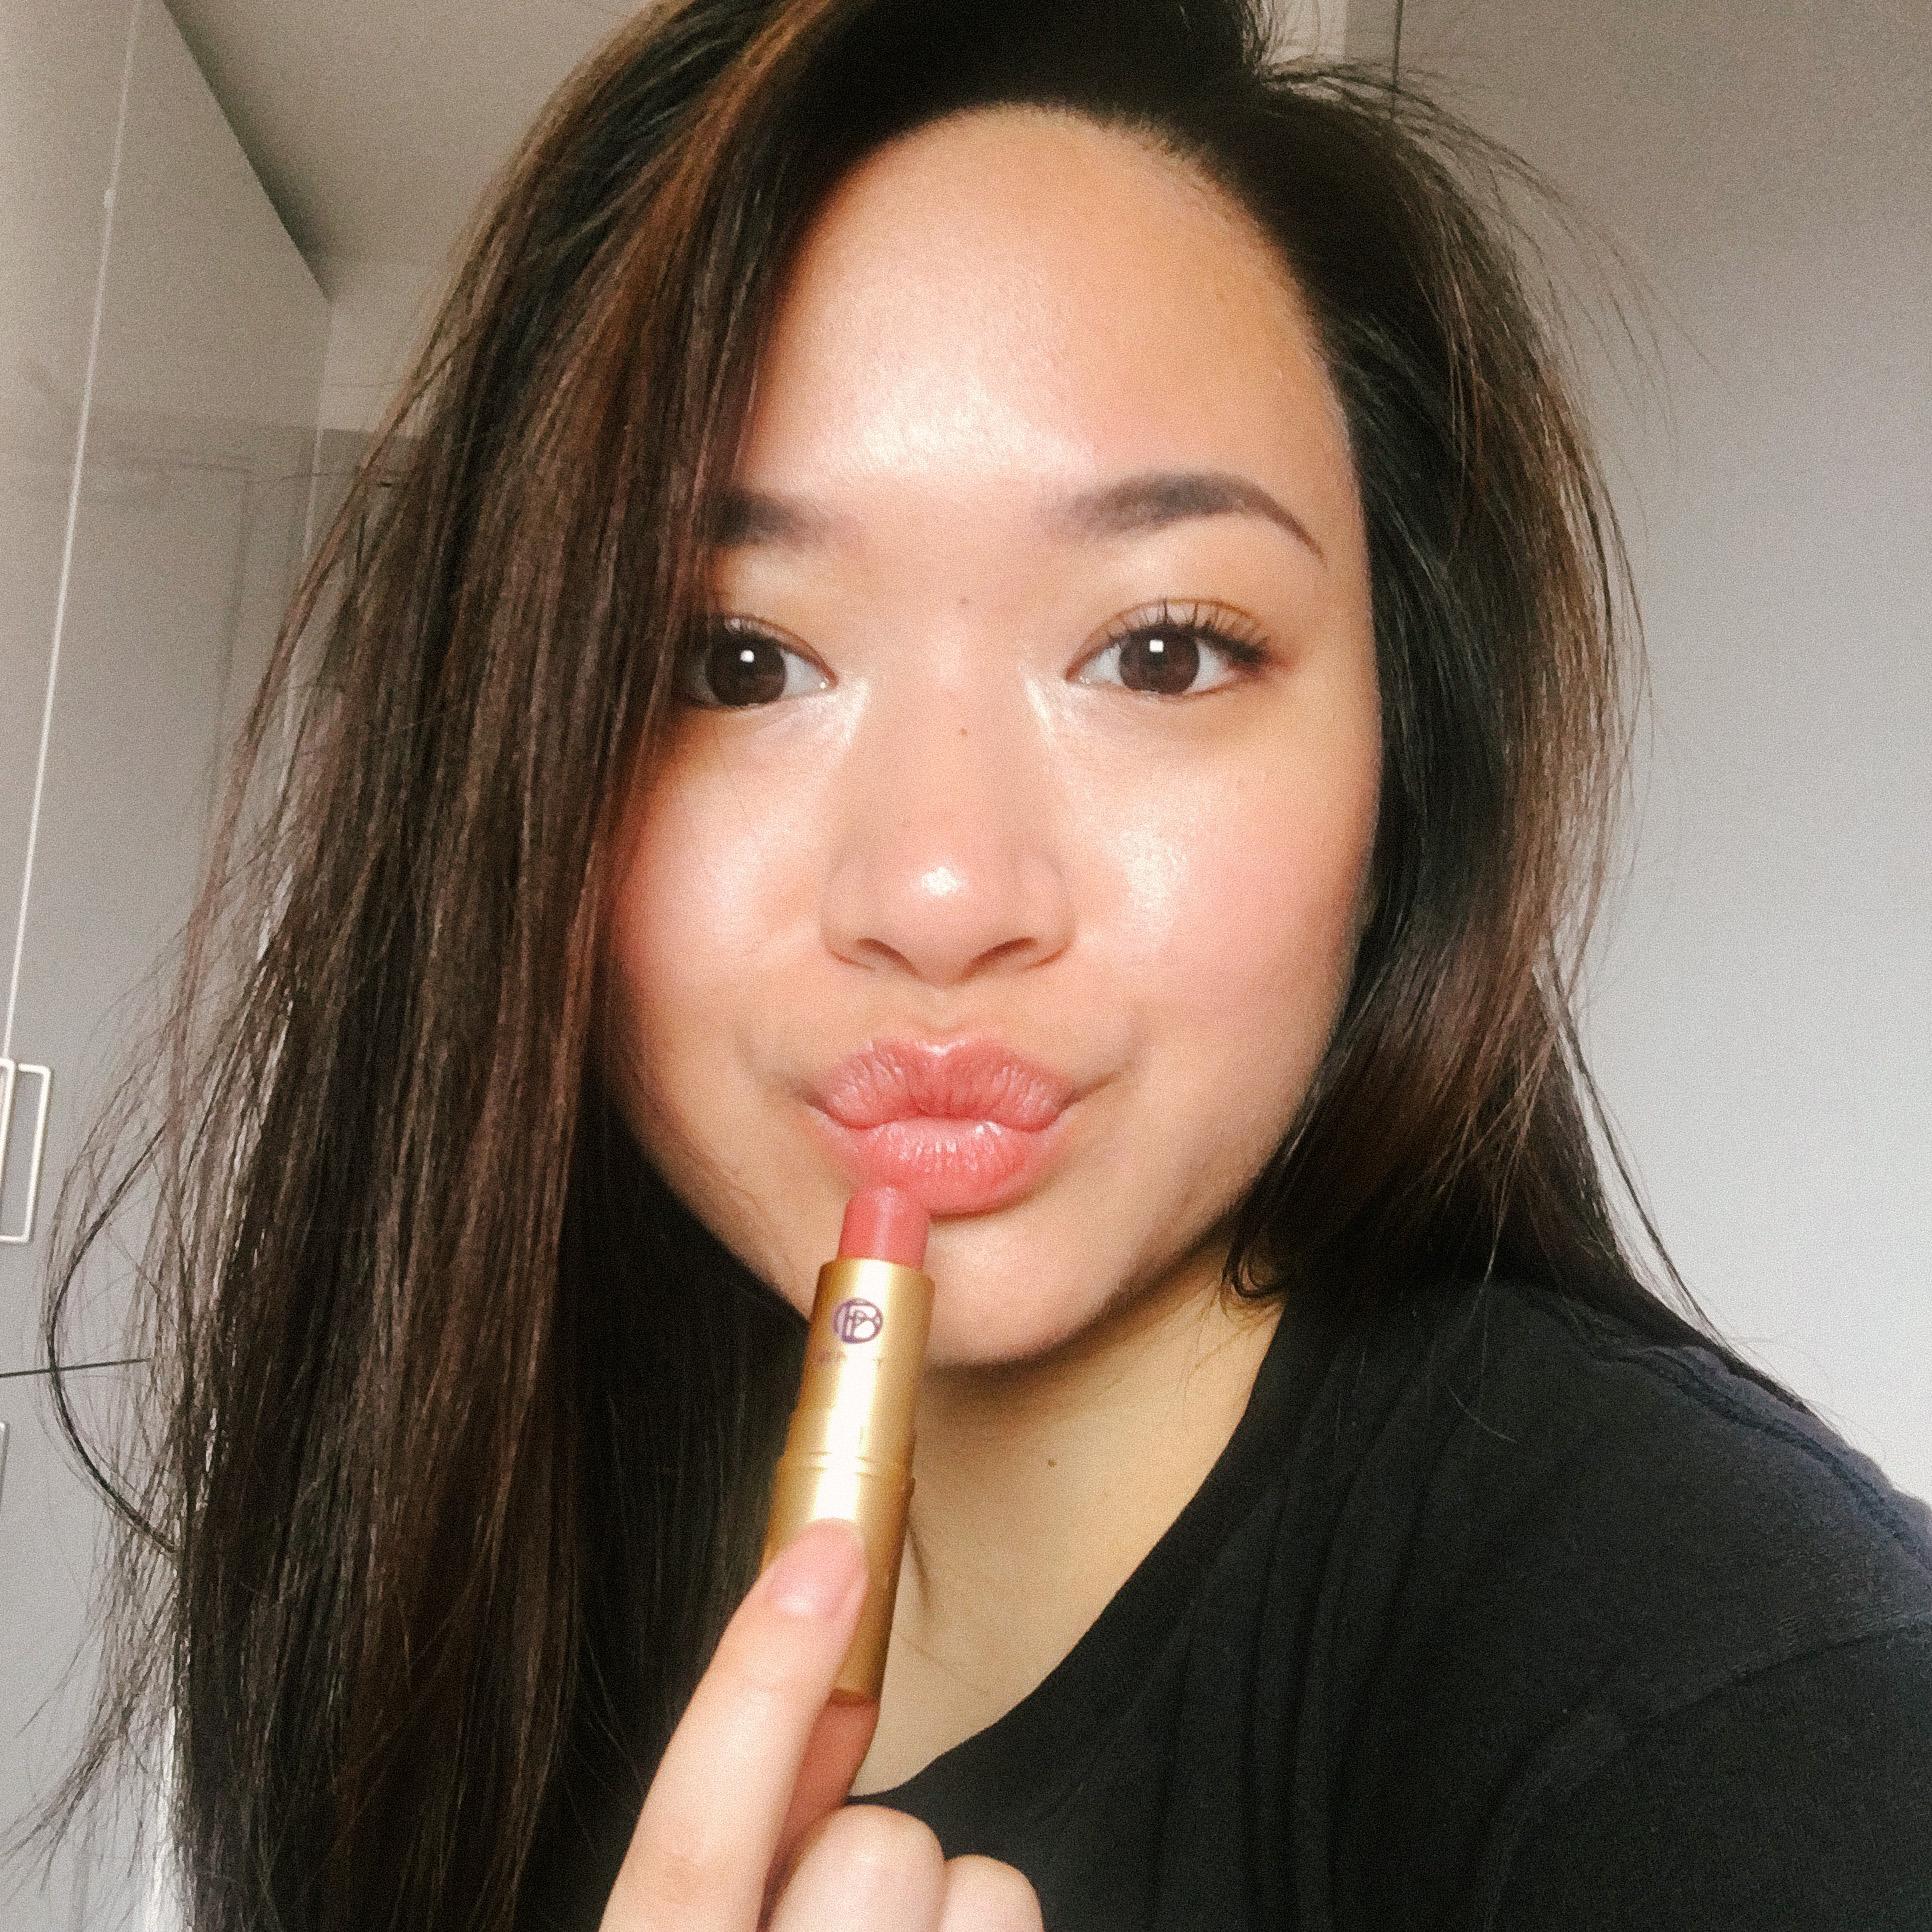 Saint Sheer Lipstick in Saint Nude